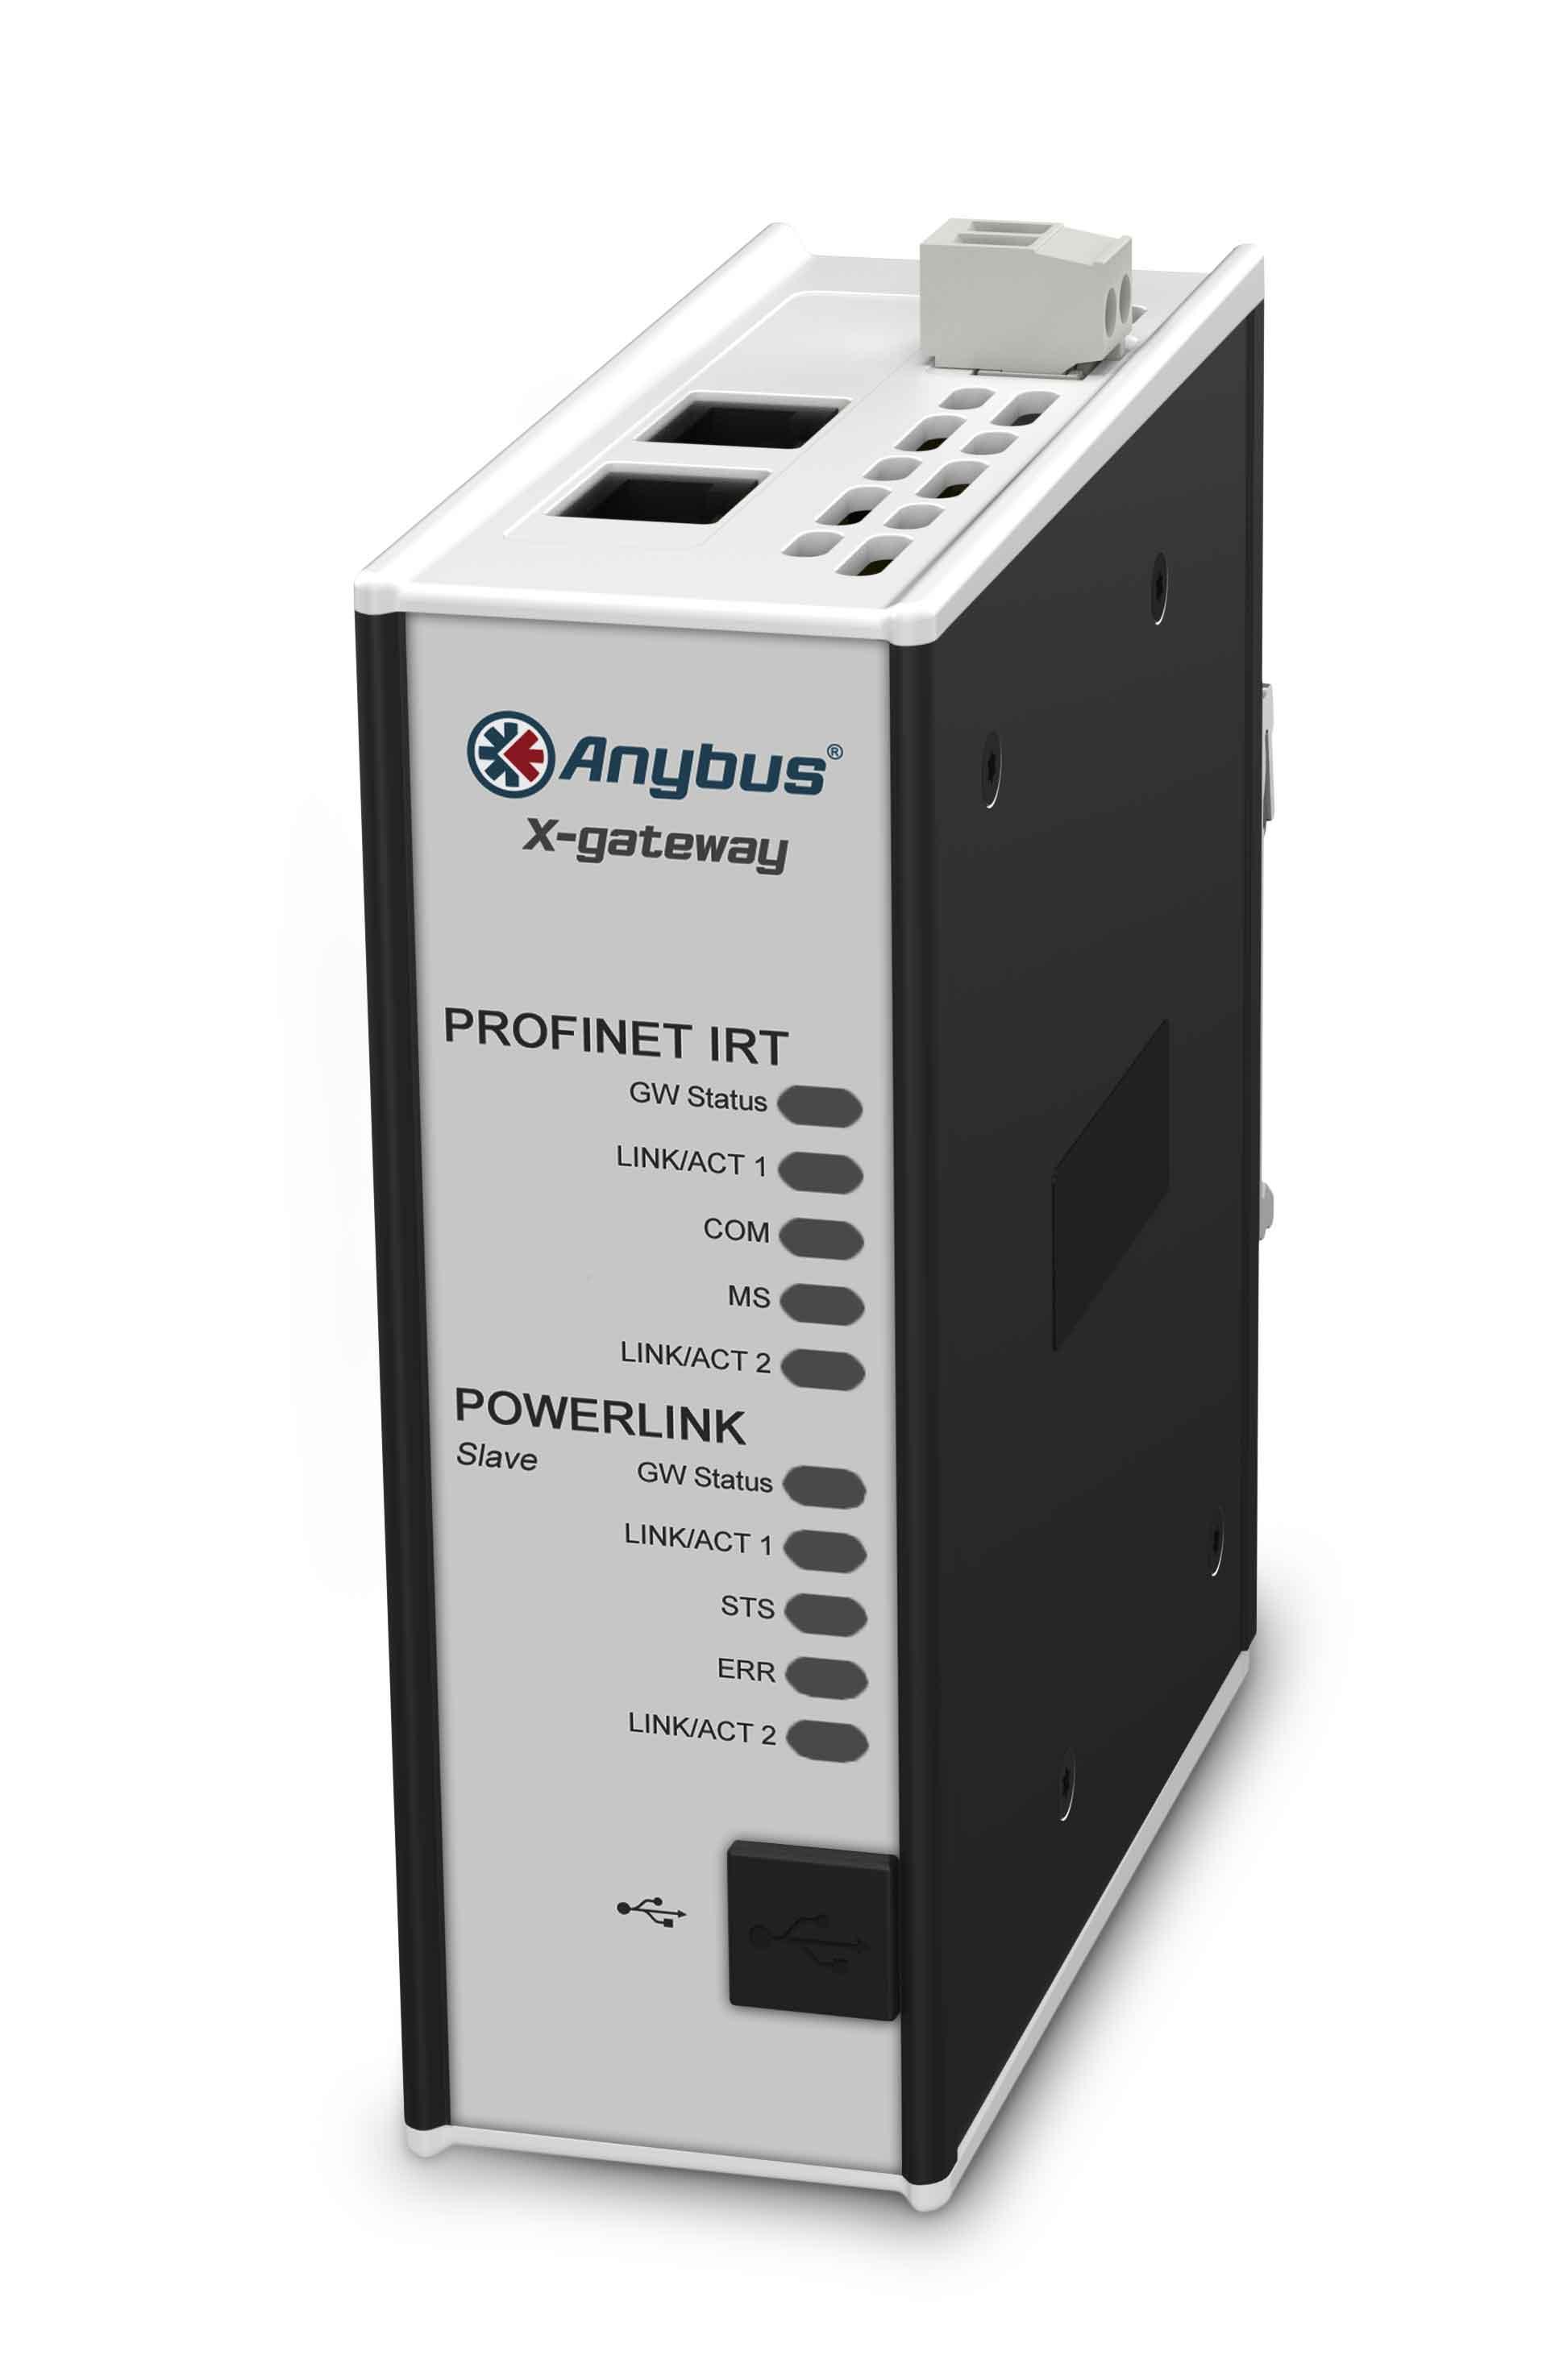 PROFINET IRT Slave - POWERLINK Device - AB7540-F